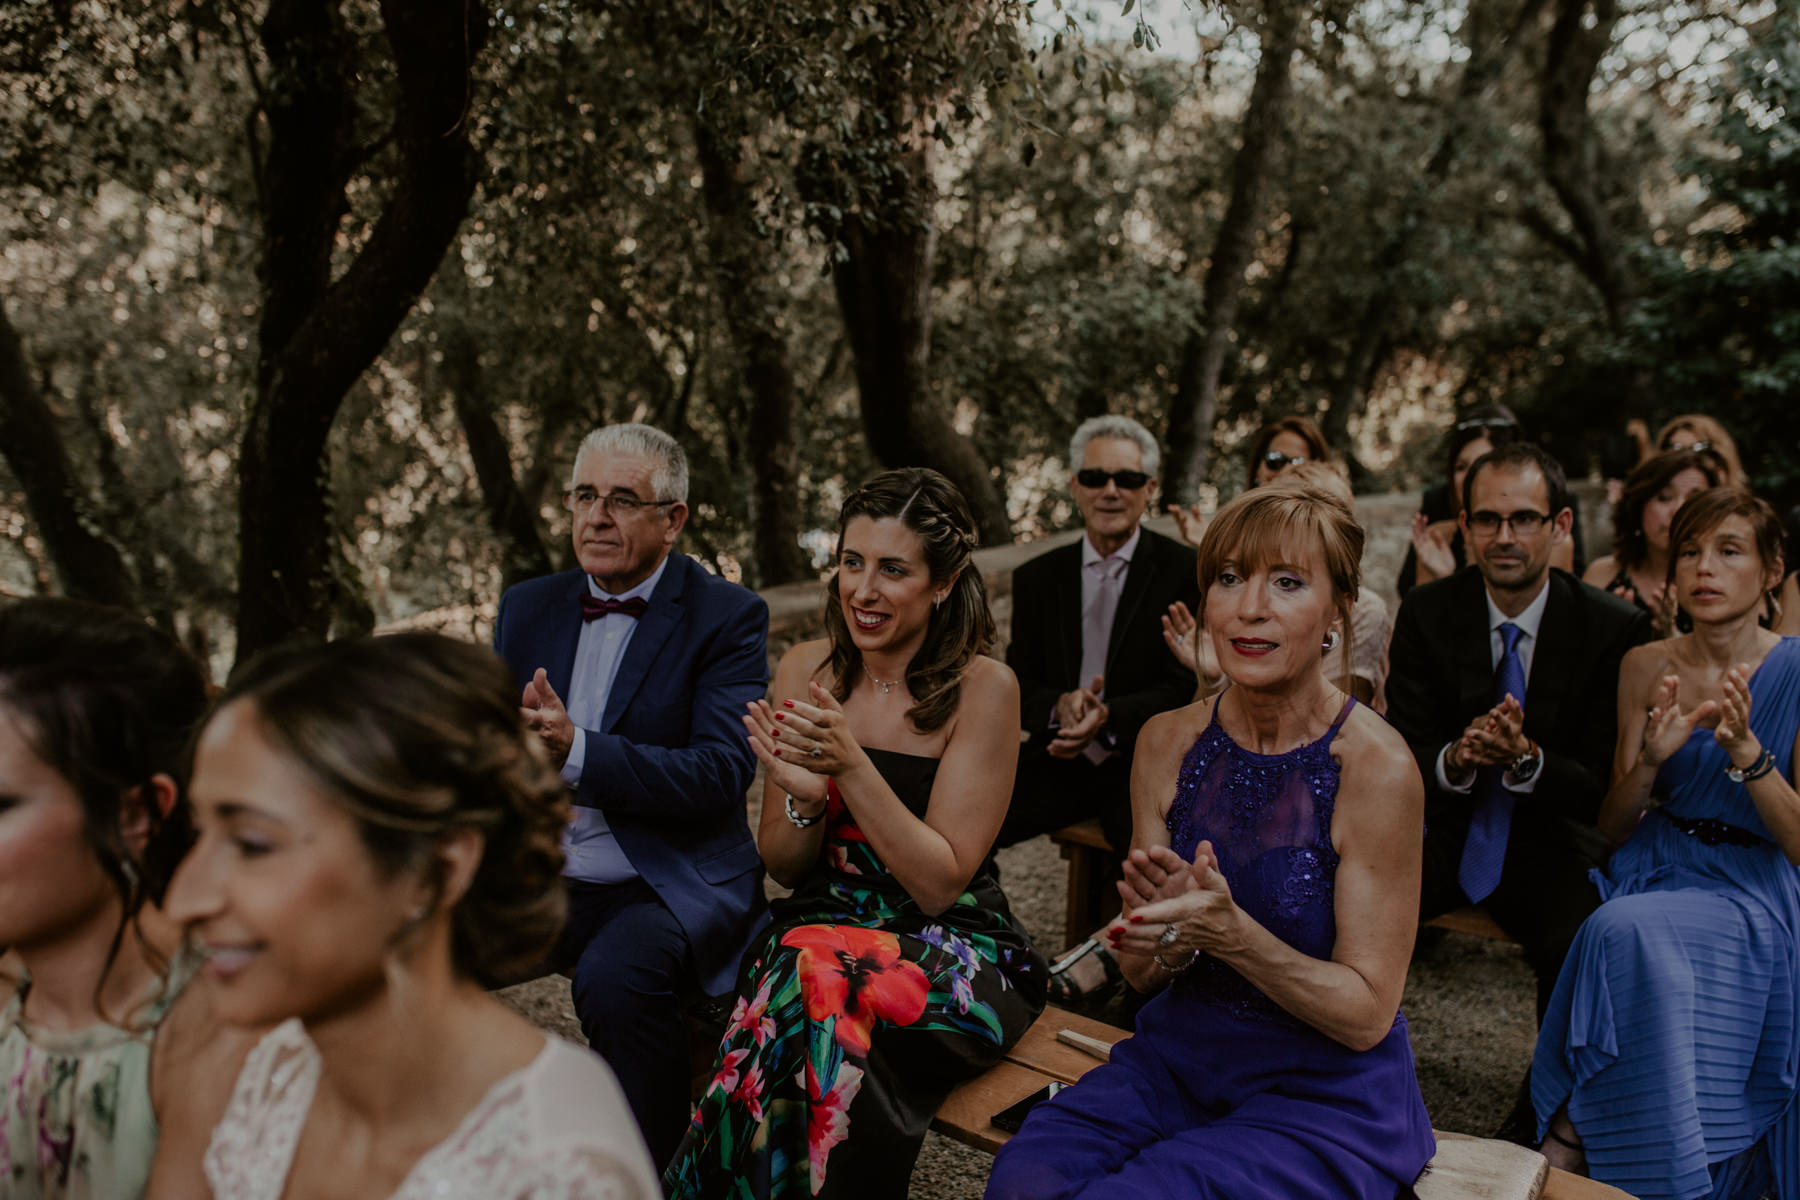 alt_thenortherngirlphotography_couples_weddingphotographer_photographer_wedding_boda_fotografodebodas_fotografobodasbarcelona_bodaindie_bodasconestilo_bodaensantperedeclara_jennifermiguel-349.jpg